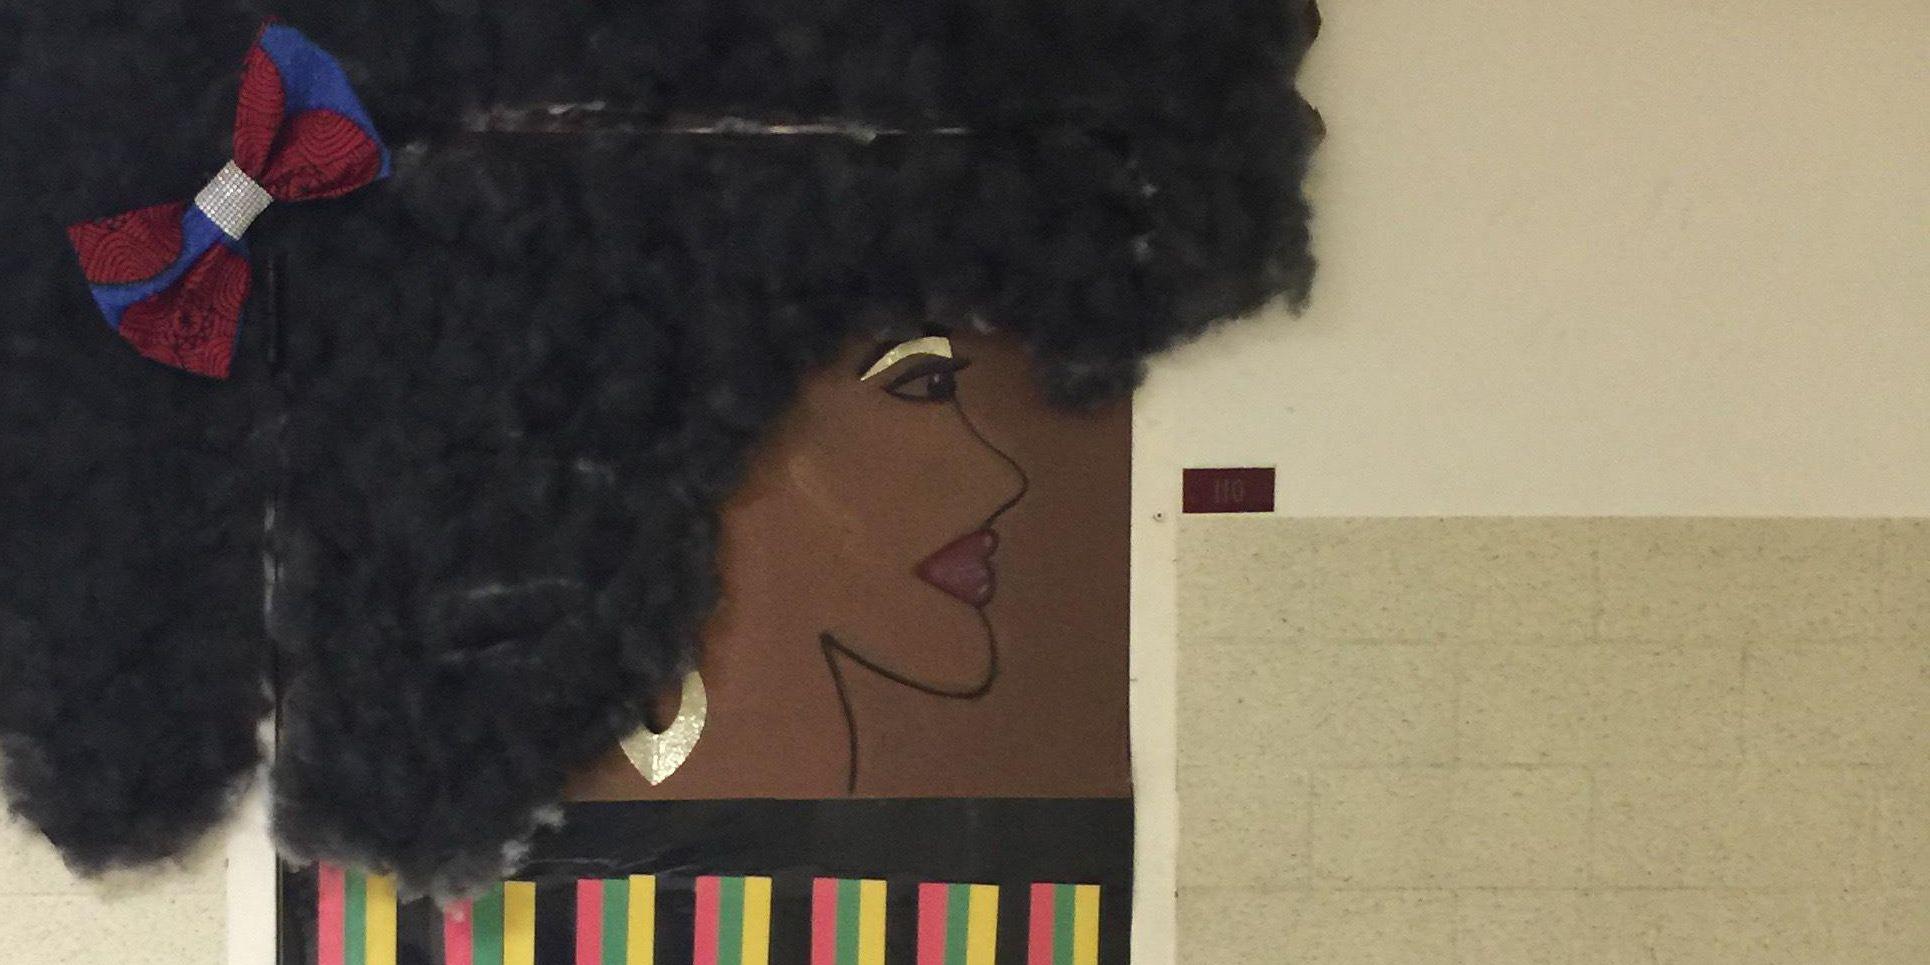 Dunbar celebrates Black History Month through art